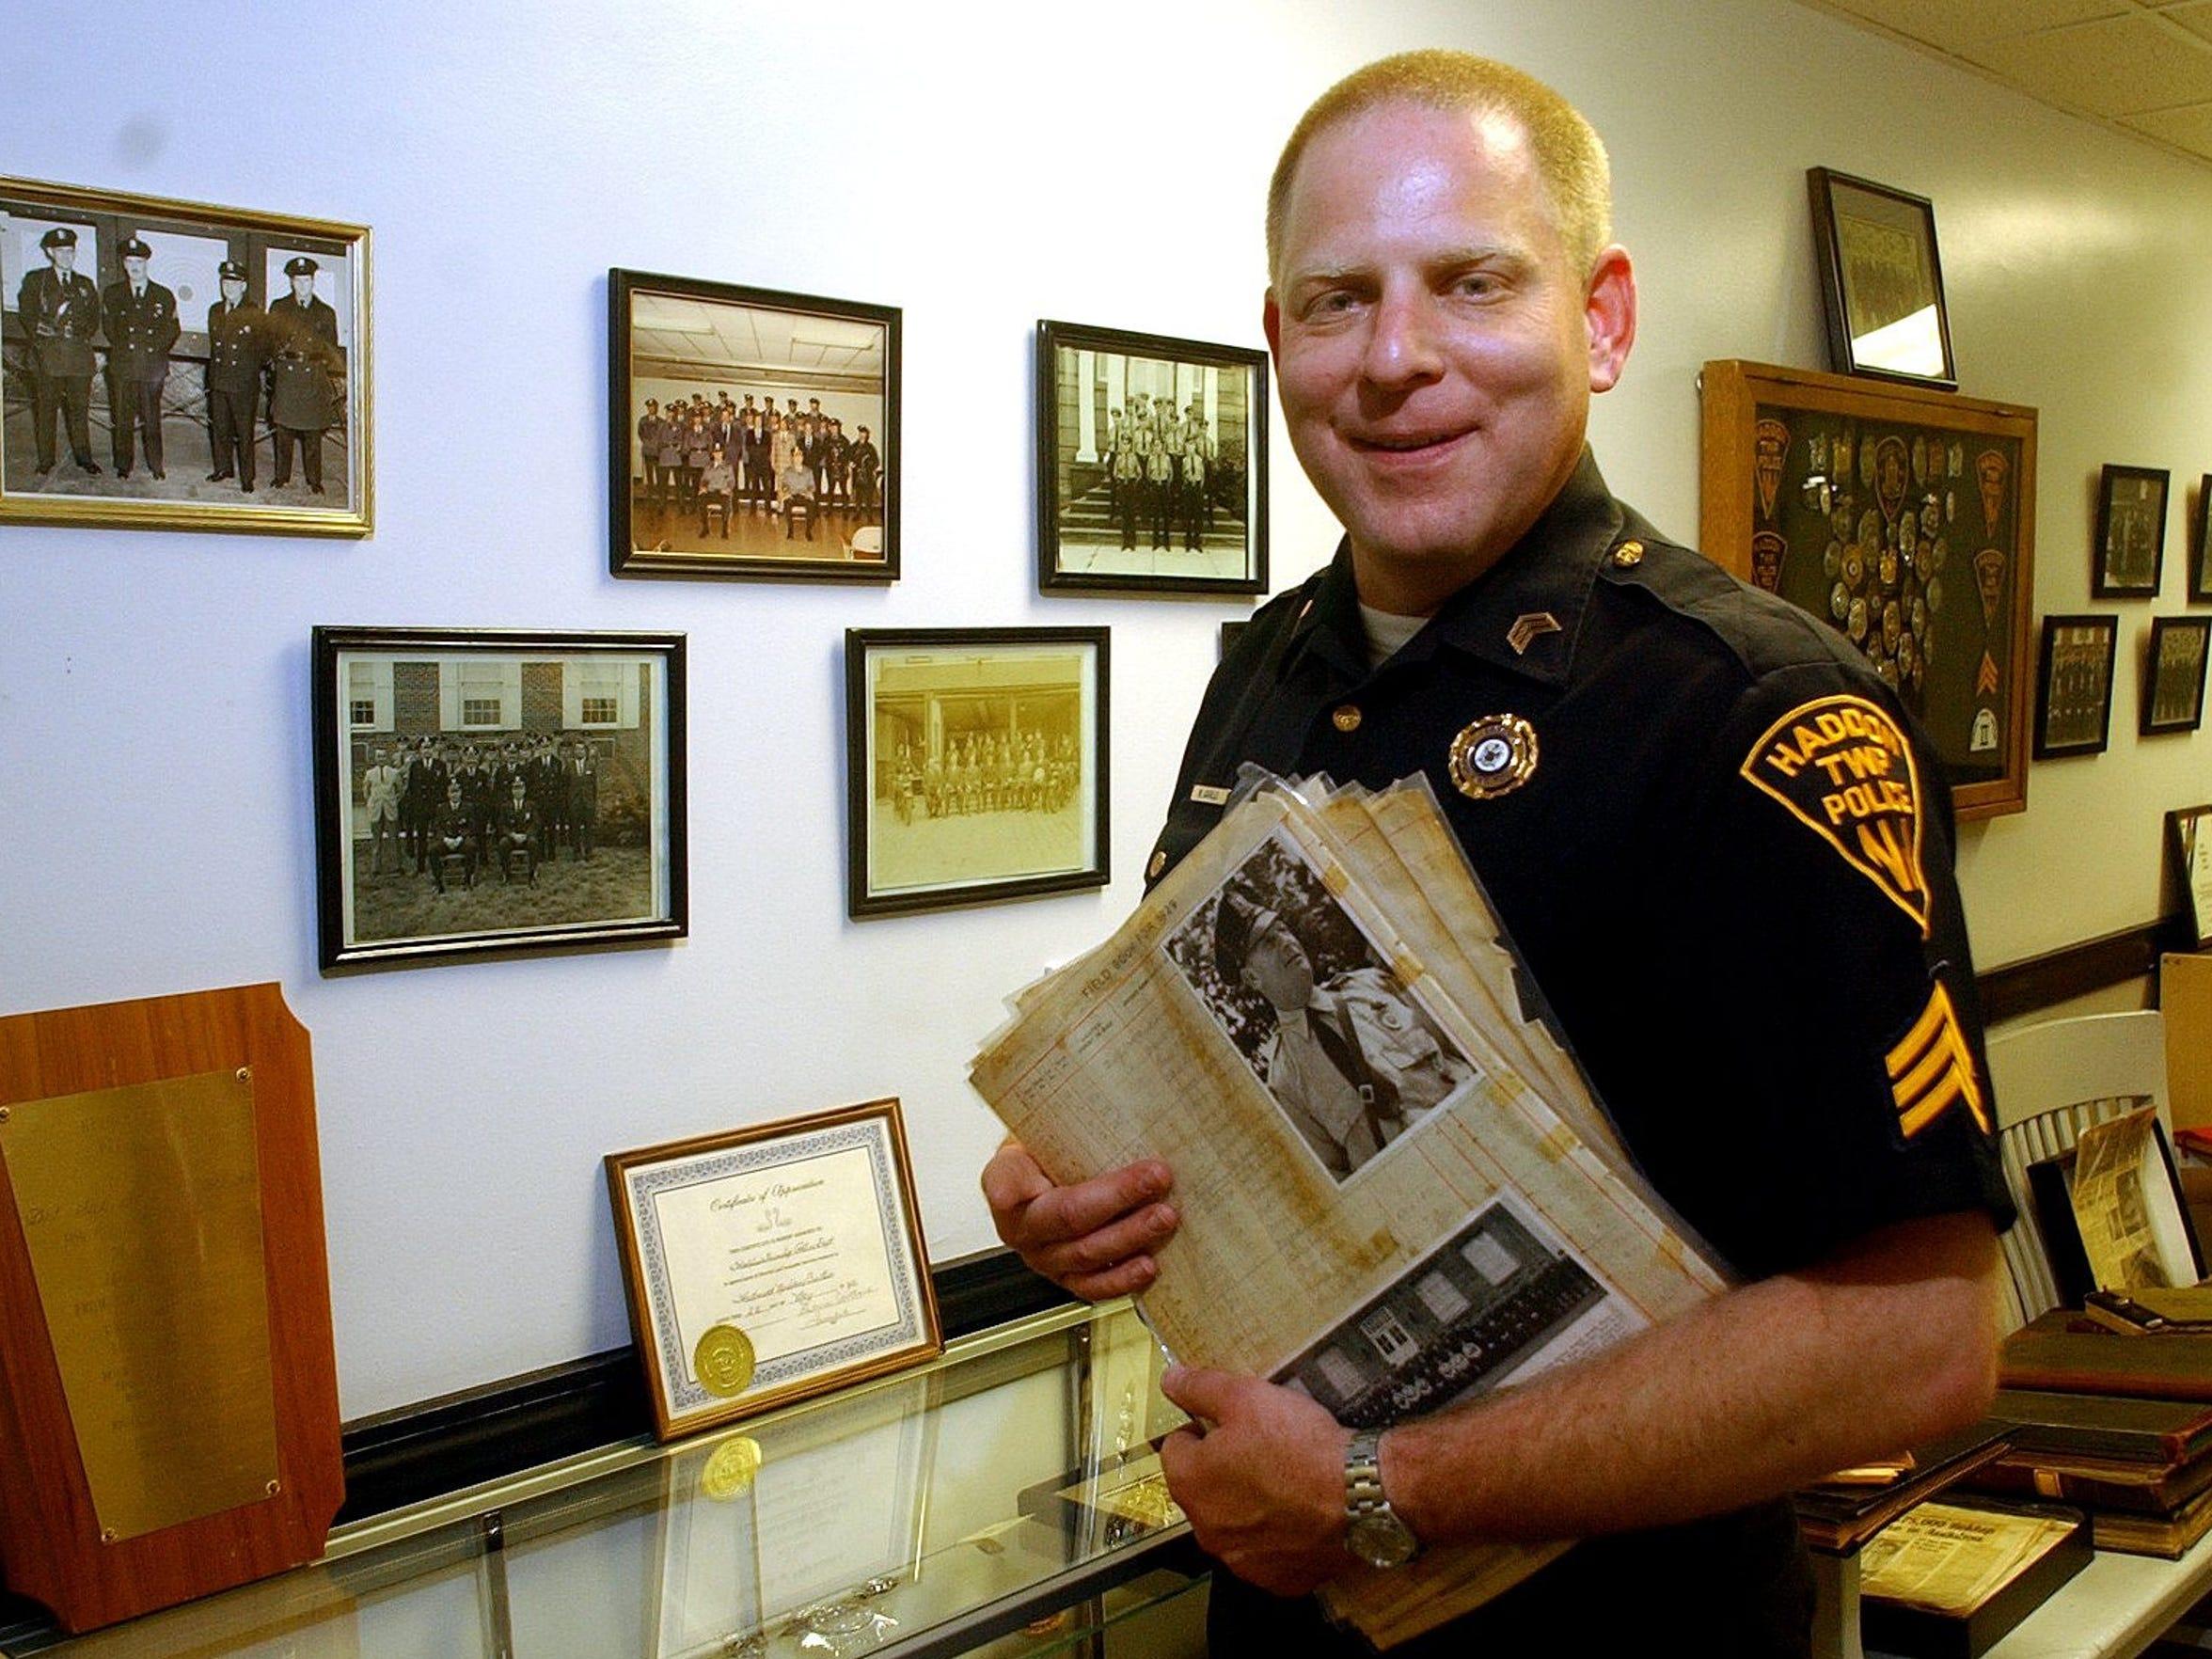 Haddon Township Police Chief Mark Cavallo